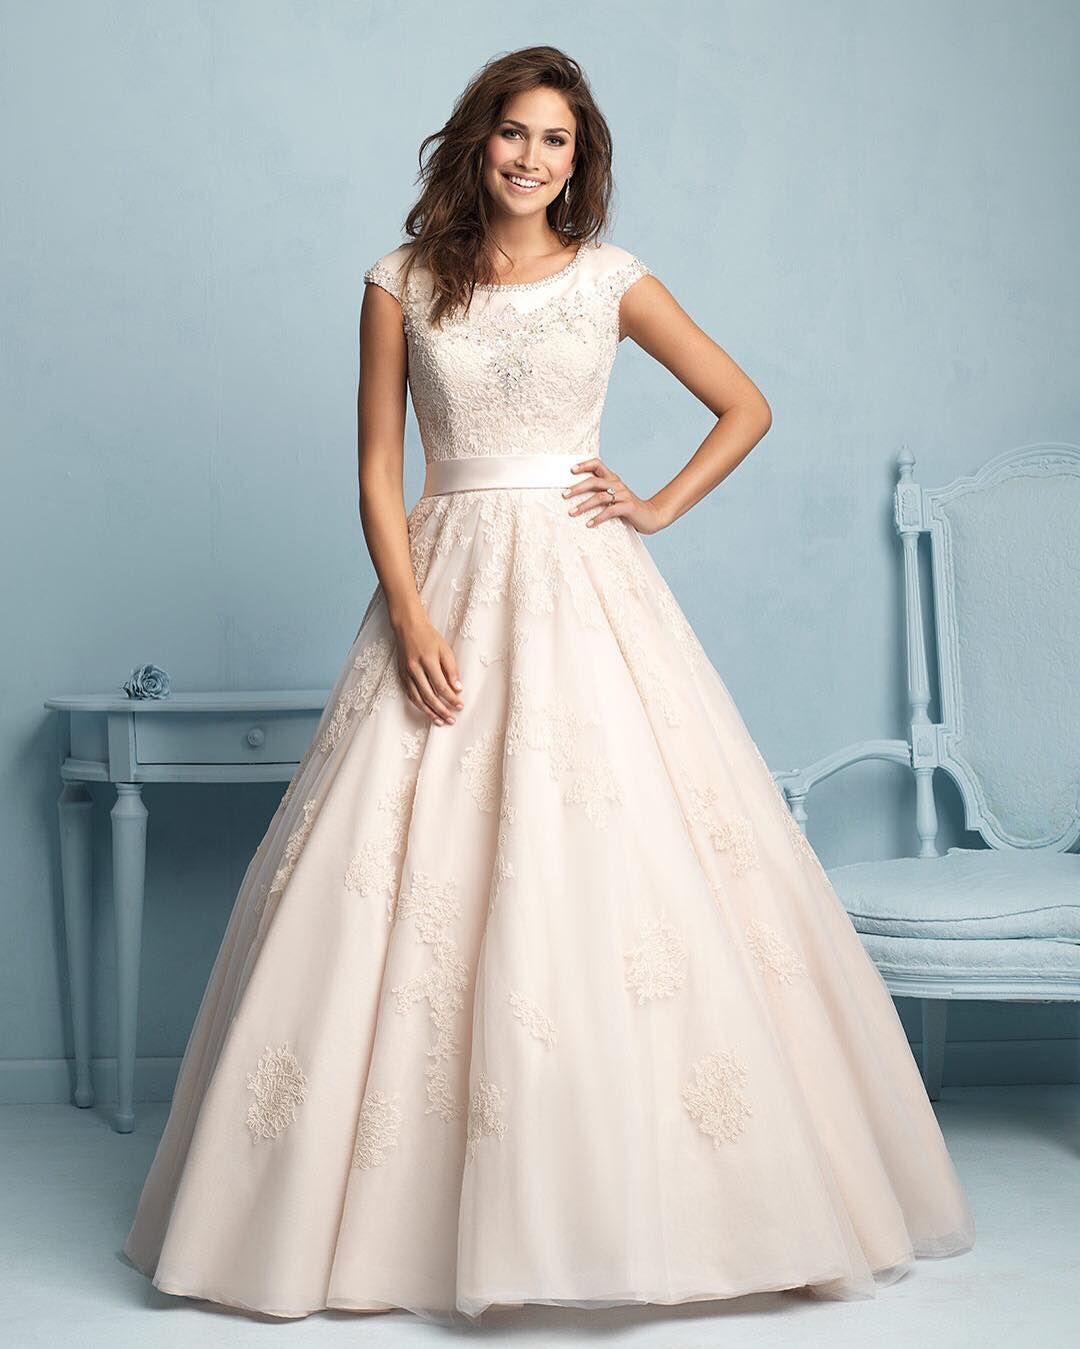 Literally my wedding dress. 8/22/2015 Love it! | My Happily Ever ...